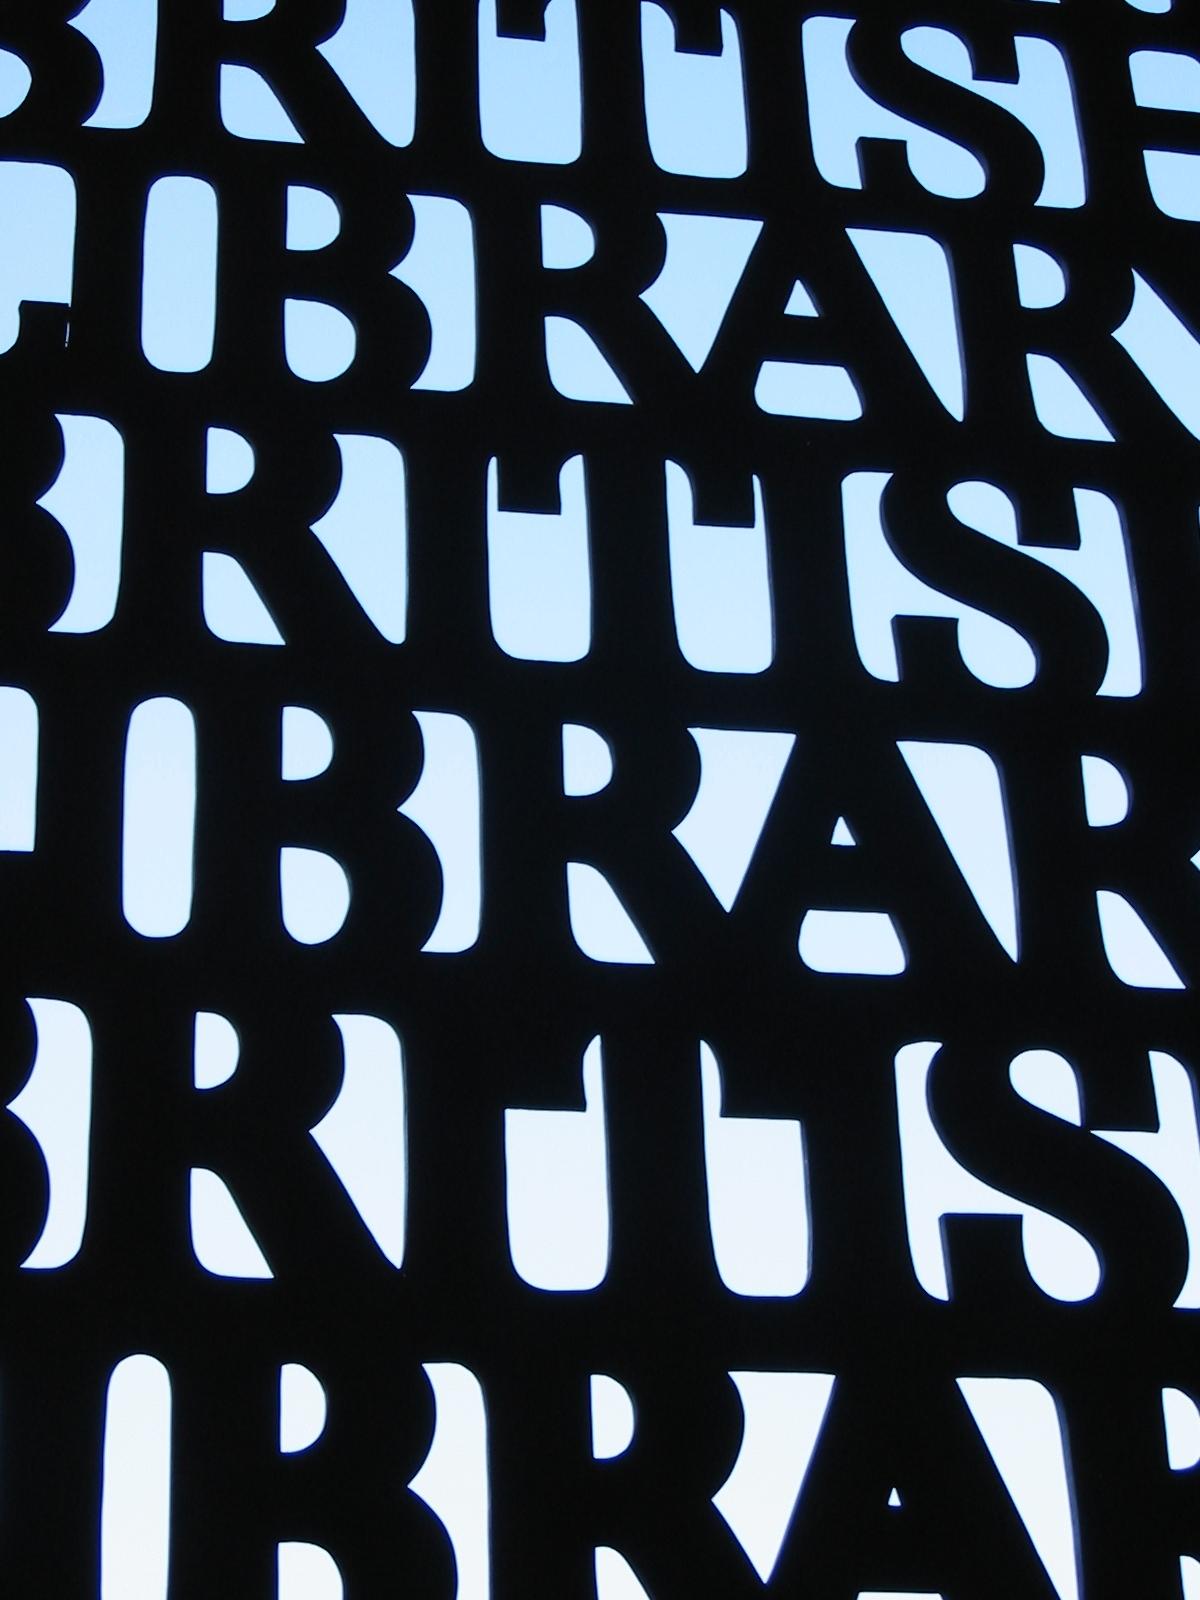 file british library gate words jpg  file british library gate words jpg